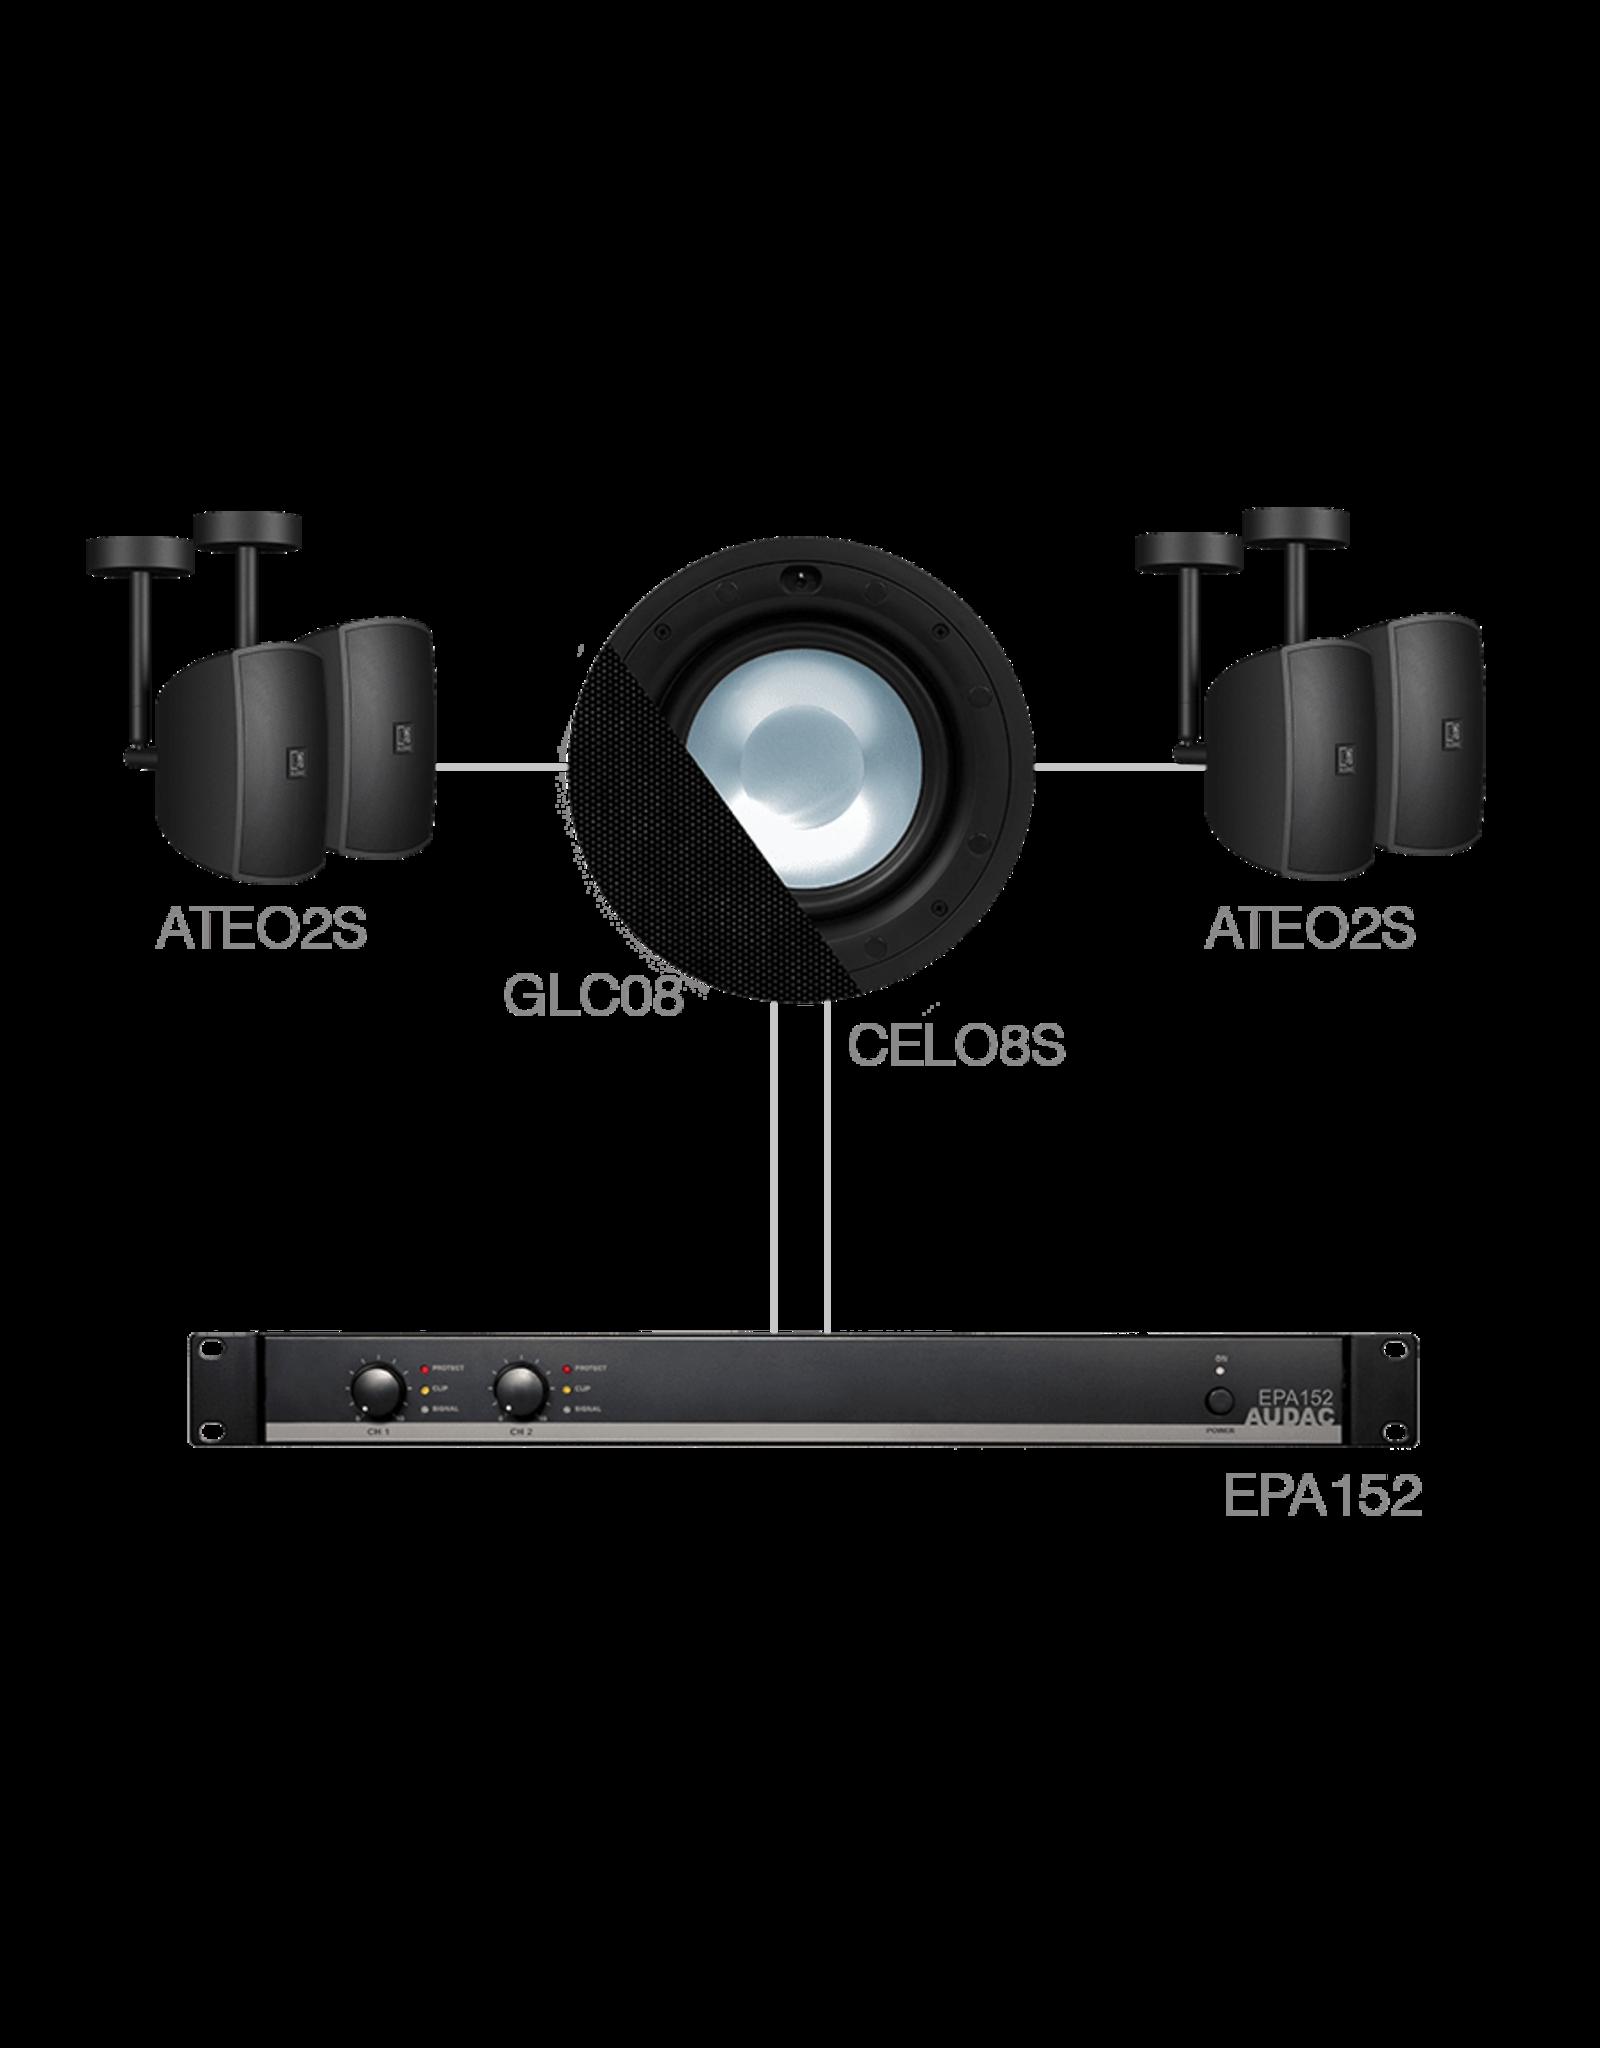 Audac 4 x ATEO2S + CELO8S + EPA152 Black